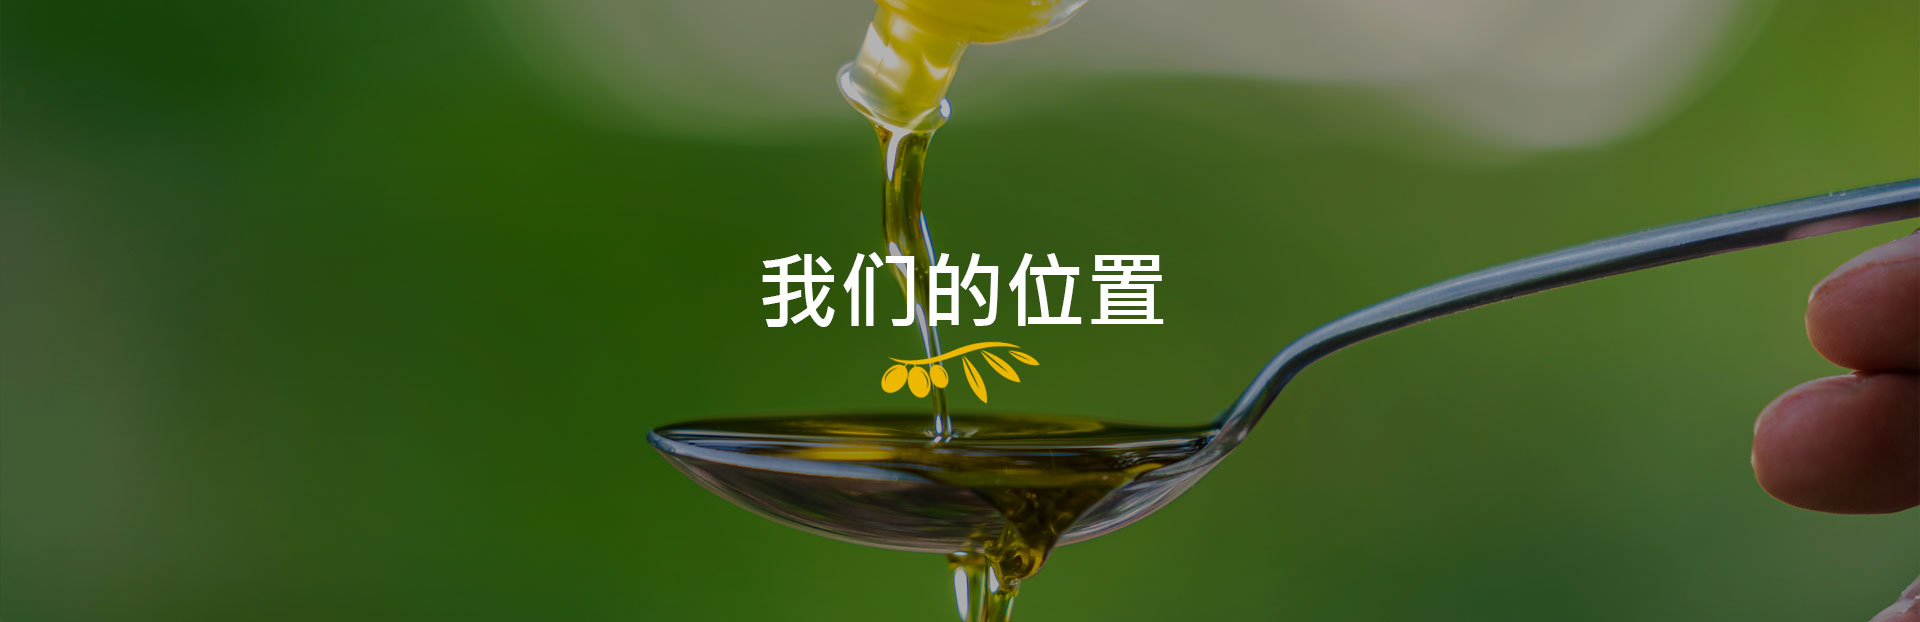 AceitesUnicos_slider_dondeencontrarnos_chino